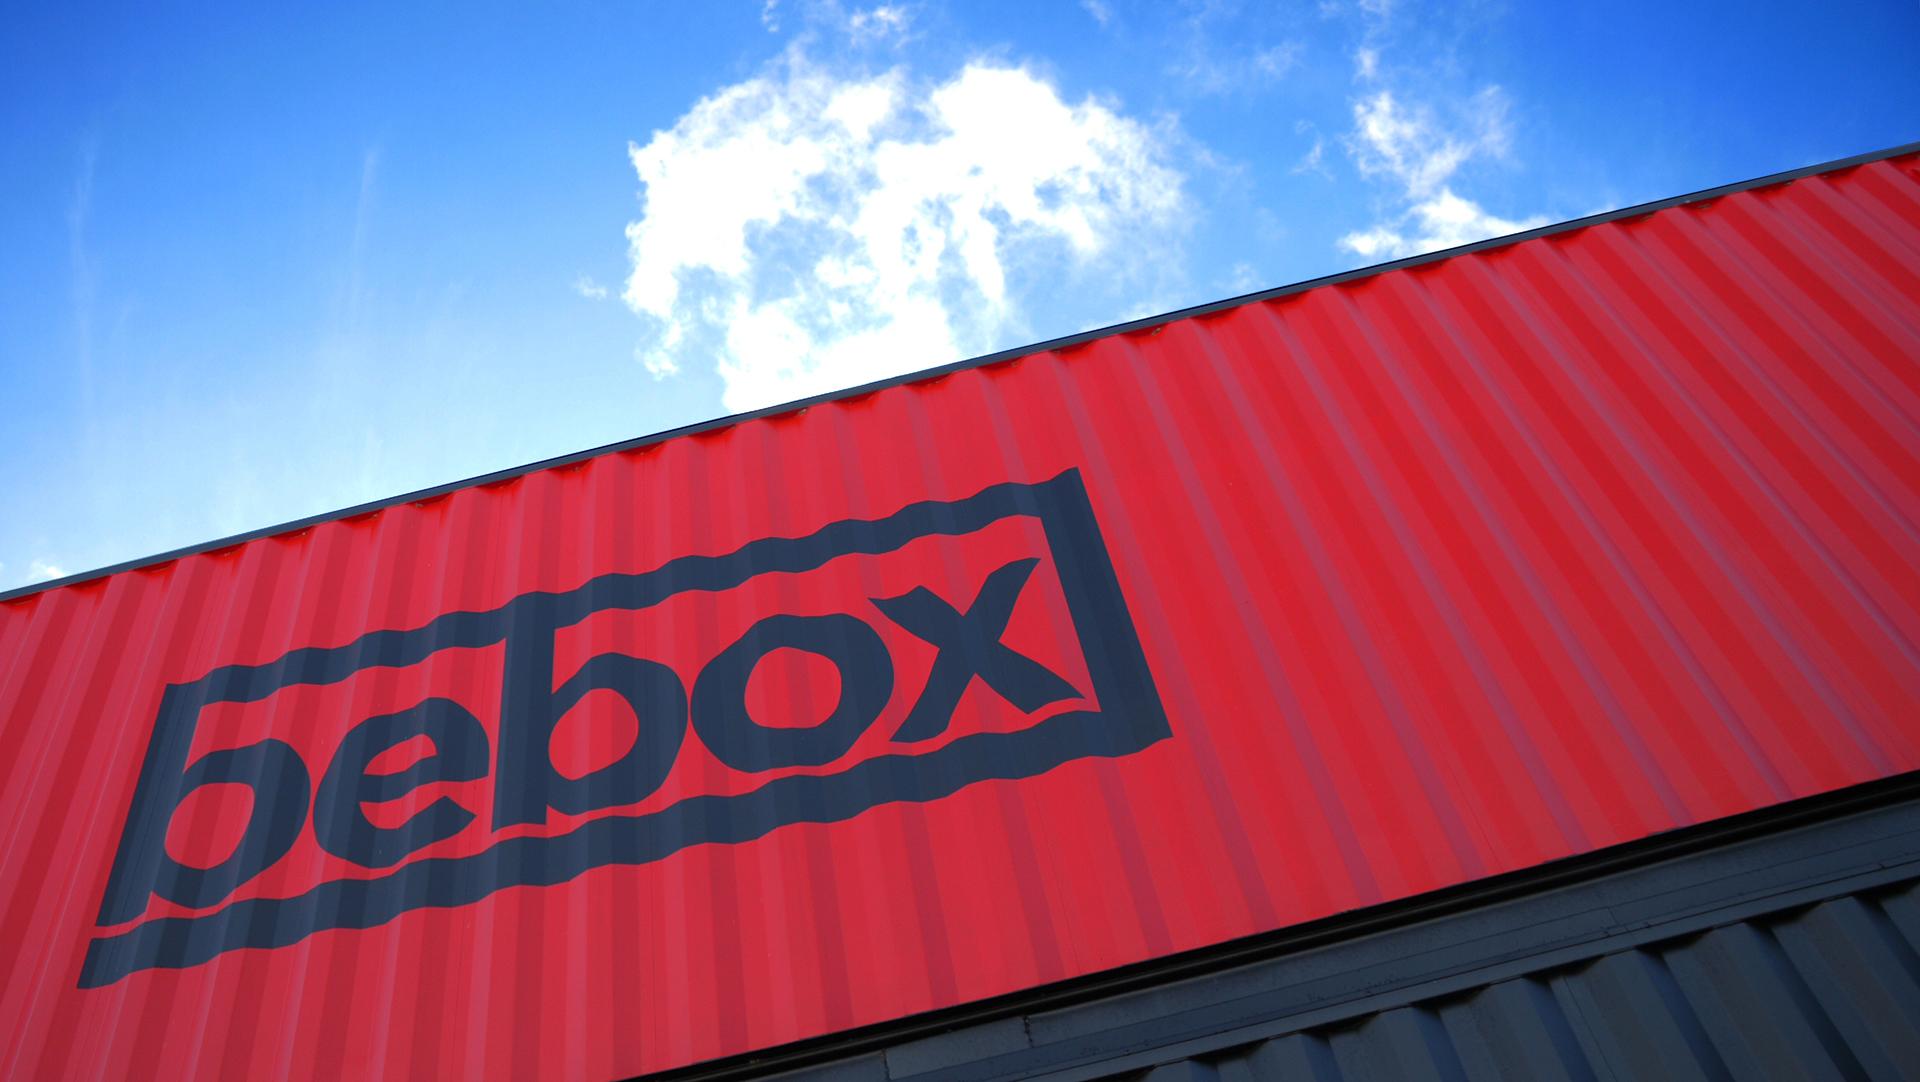 Bebox exterior sign